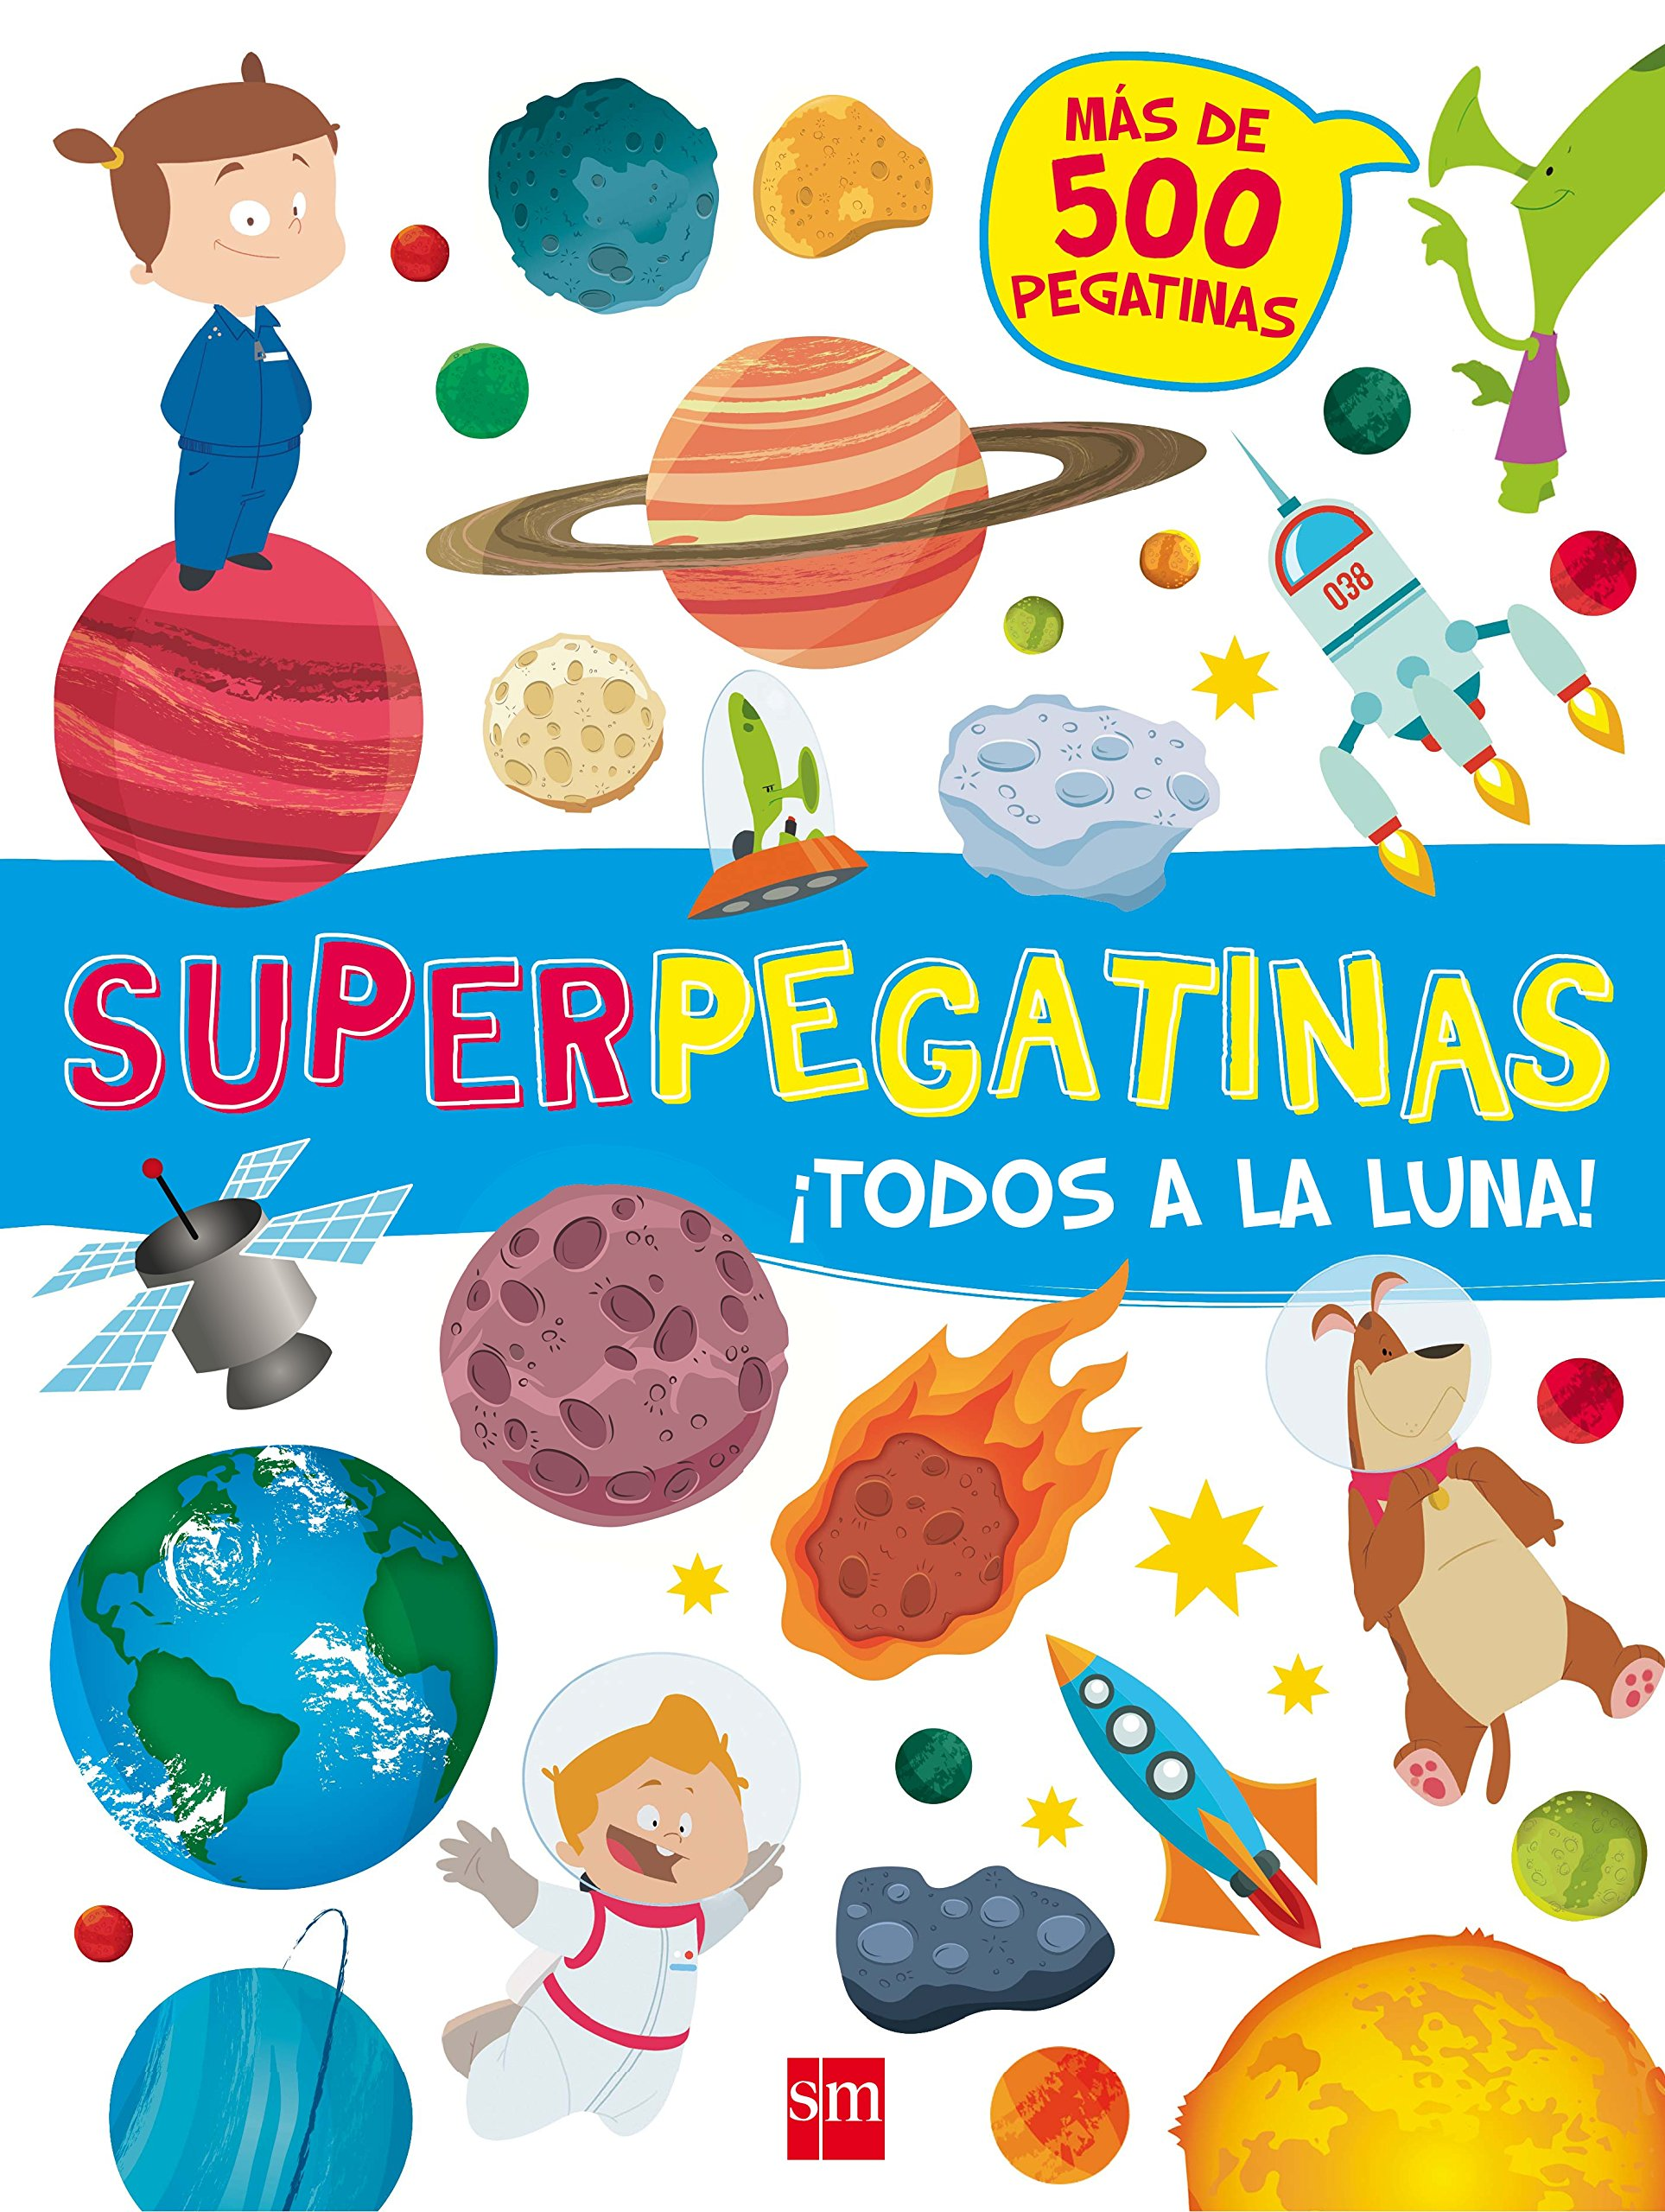 Todos a la luna! (Pegatinas): Amazon.es: Libri, De Agostini, Belloni, Valentina, Berselli, Manuel, Balzaretti, Carla: Libros